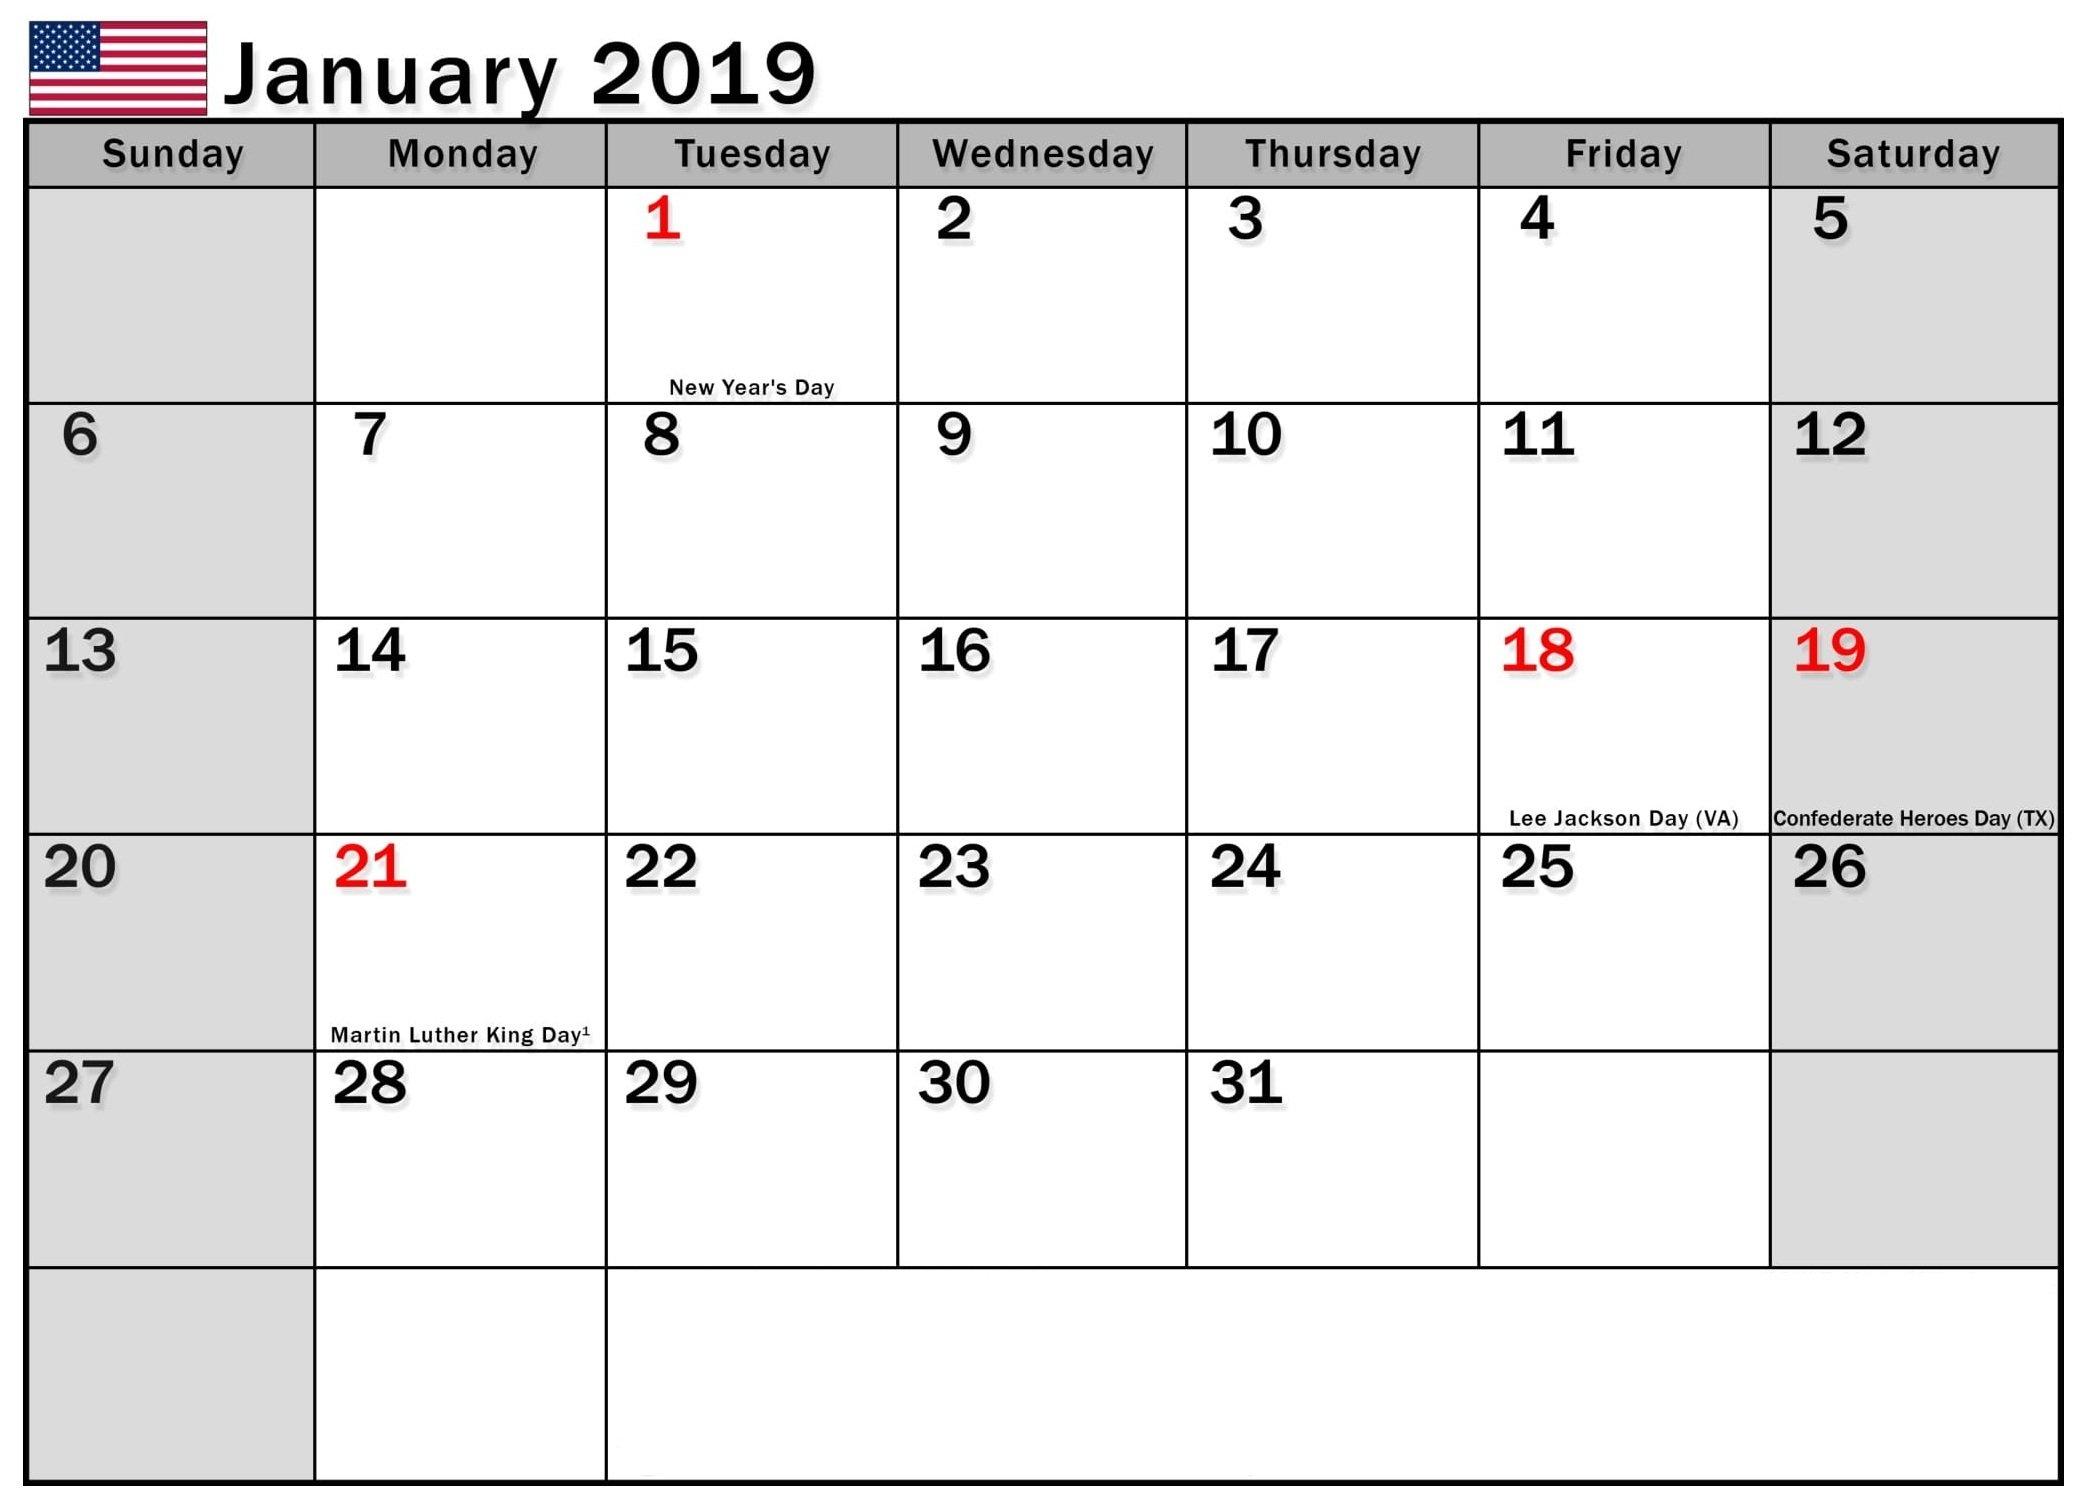 January 2019 Calendar Usa – Free Calendar Templates & Worksheets For Calendar 2019 Usa